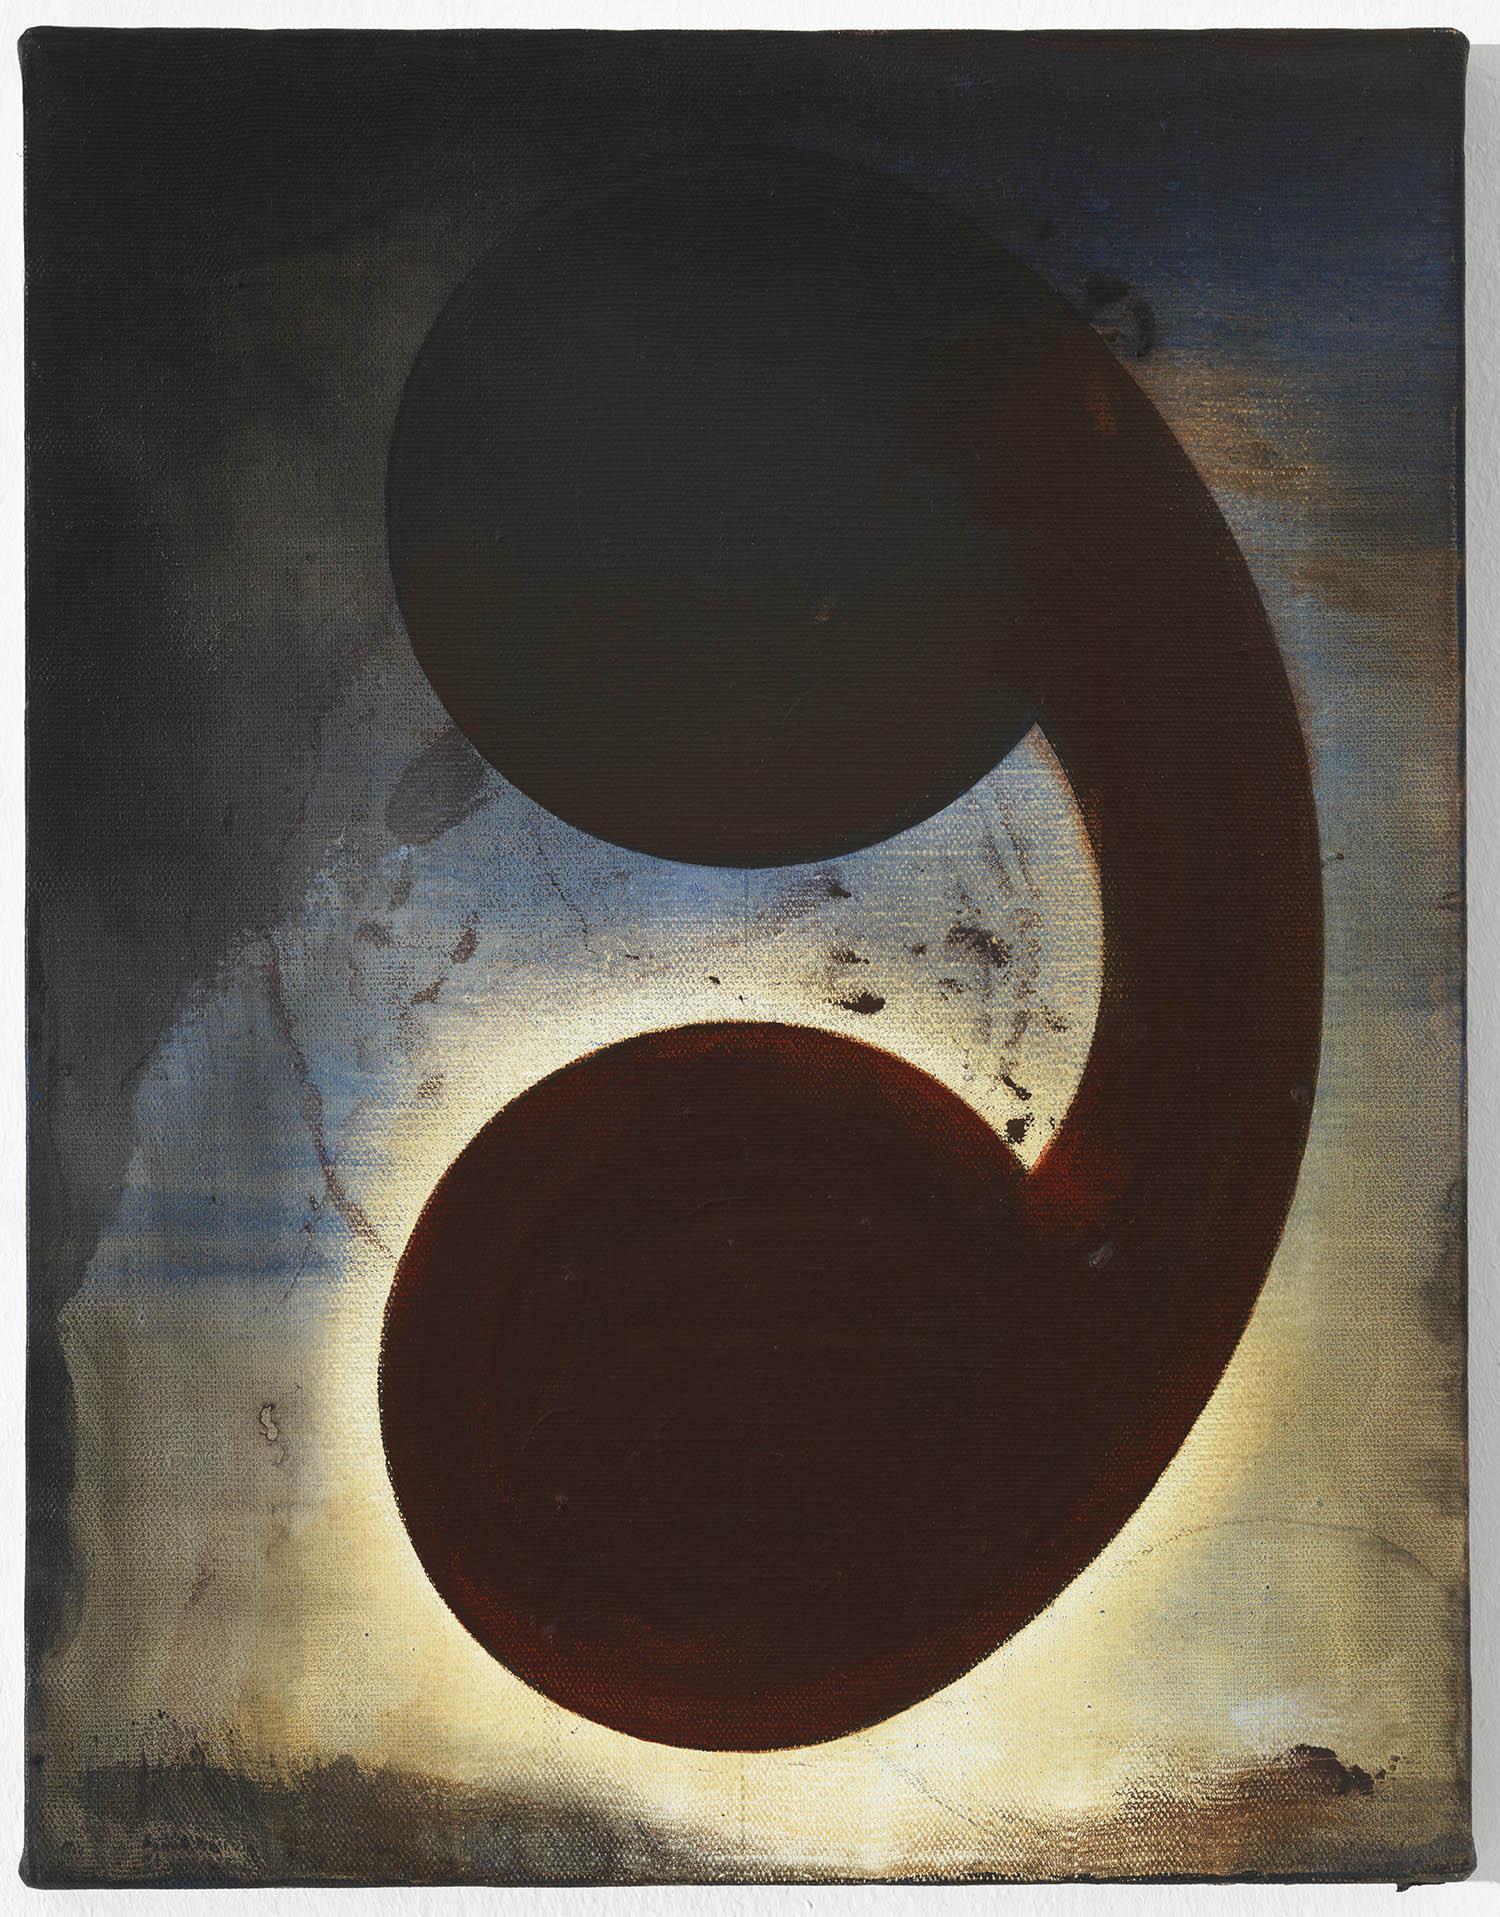 o.T. | 1991 | Acryl auf Leinwand | 46 x 35 cm